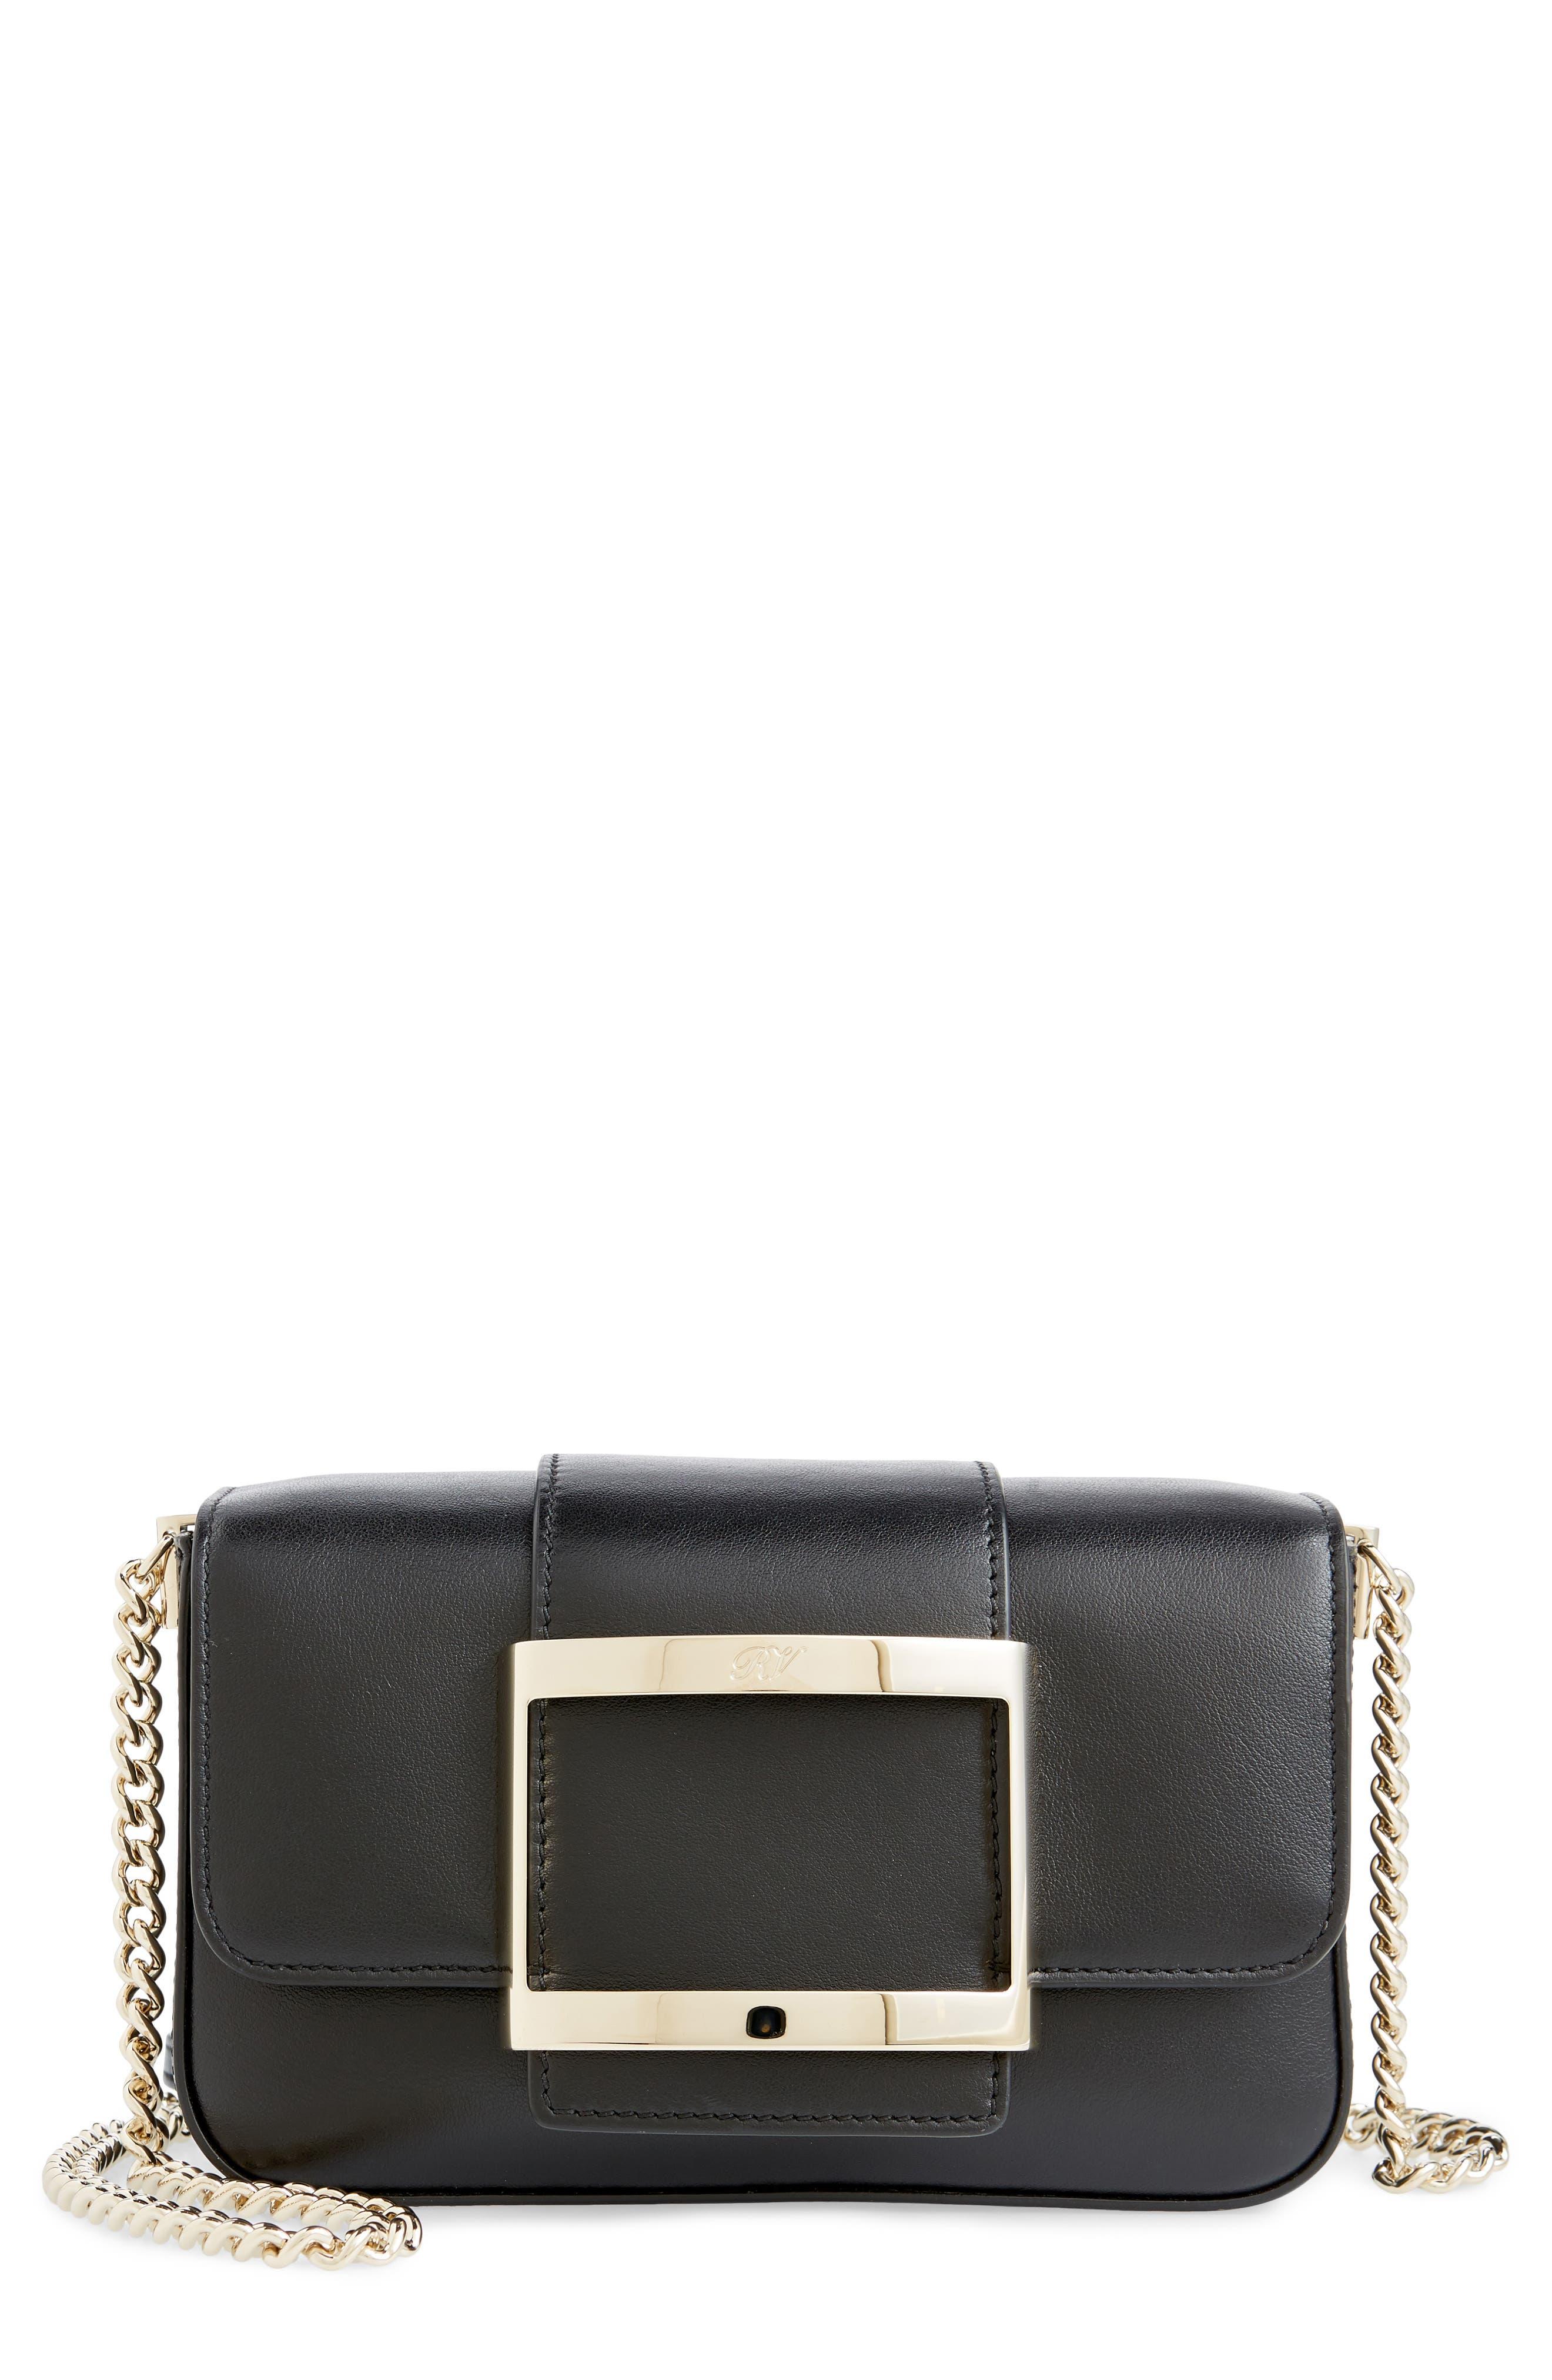 Roger Vivier Micro Très Vivier Calfskin Leather Crossbody Bag | Nordstrom